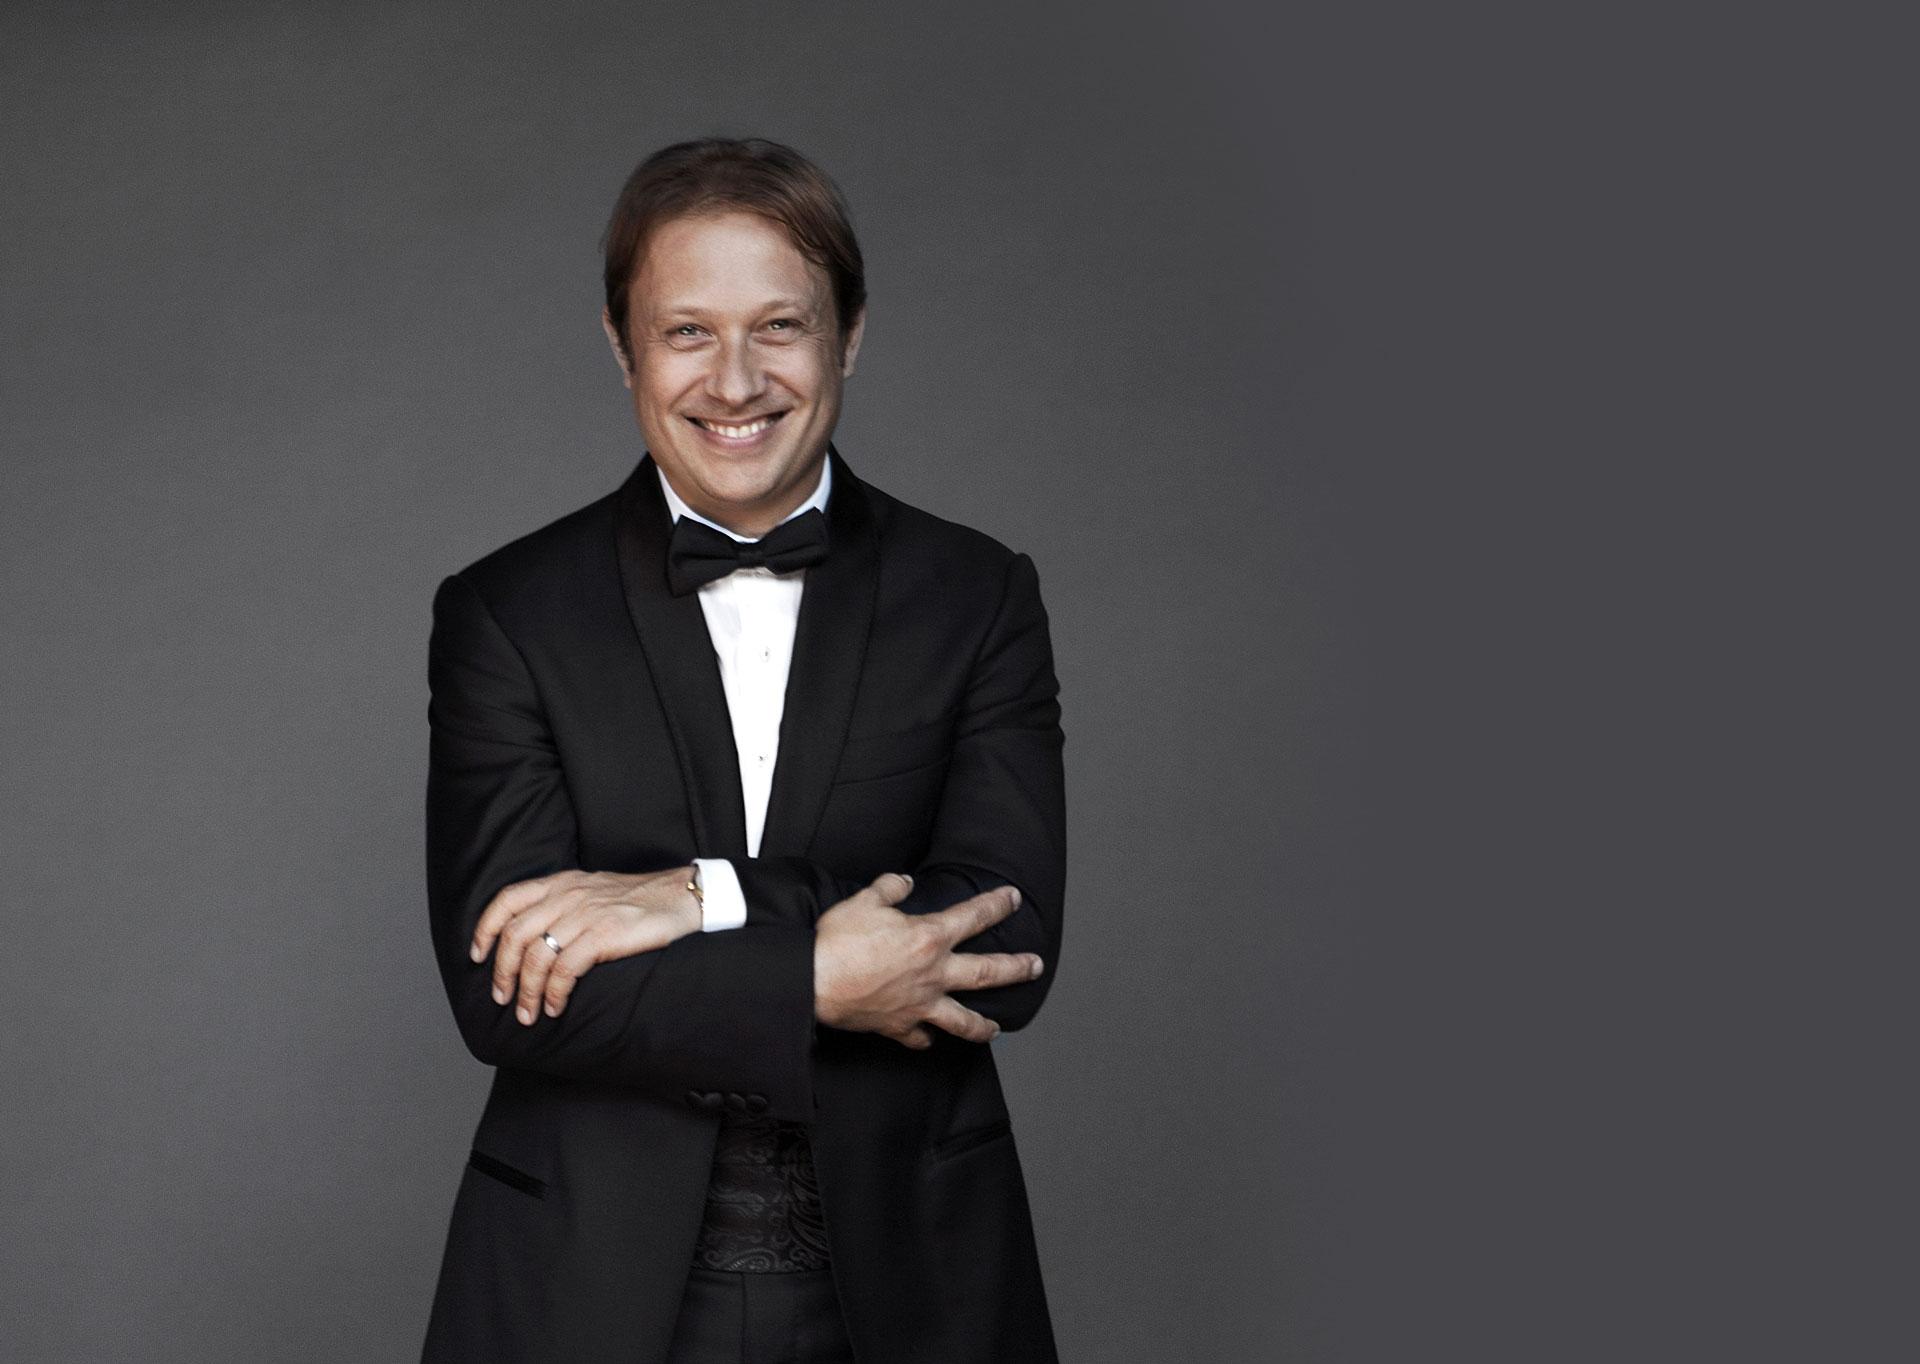 BBC Philharmonic Orchestra: Associate Artist